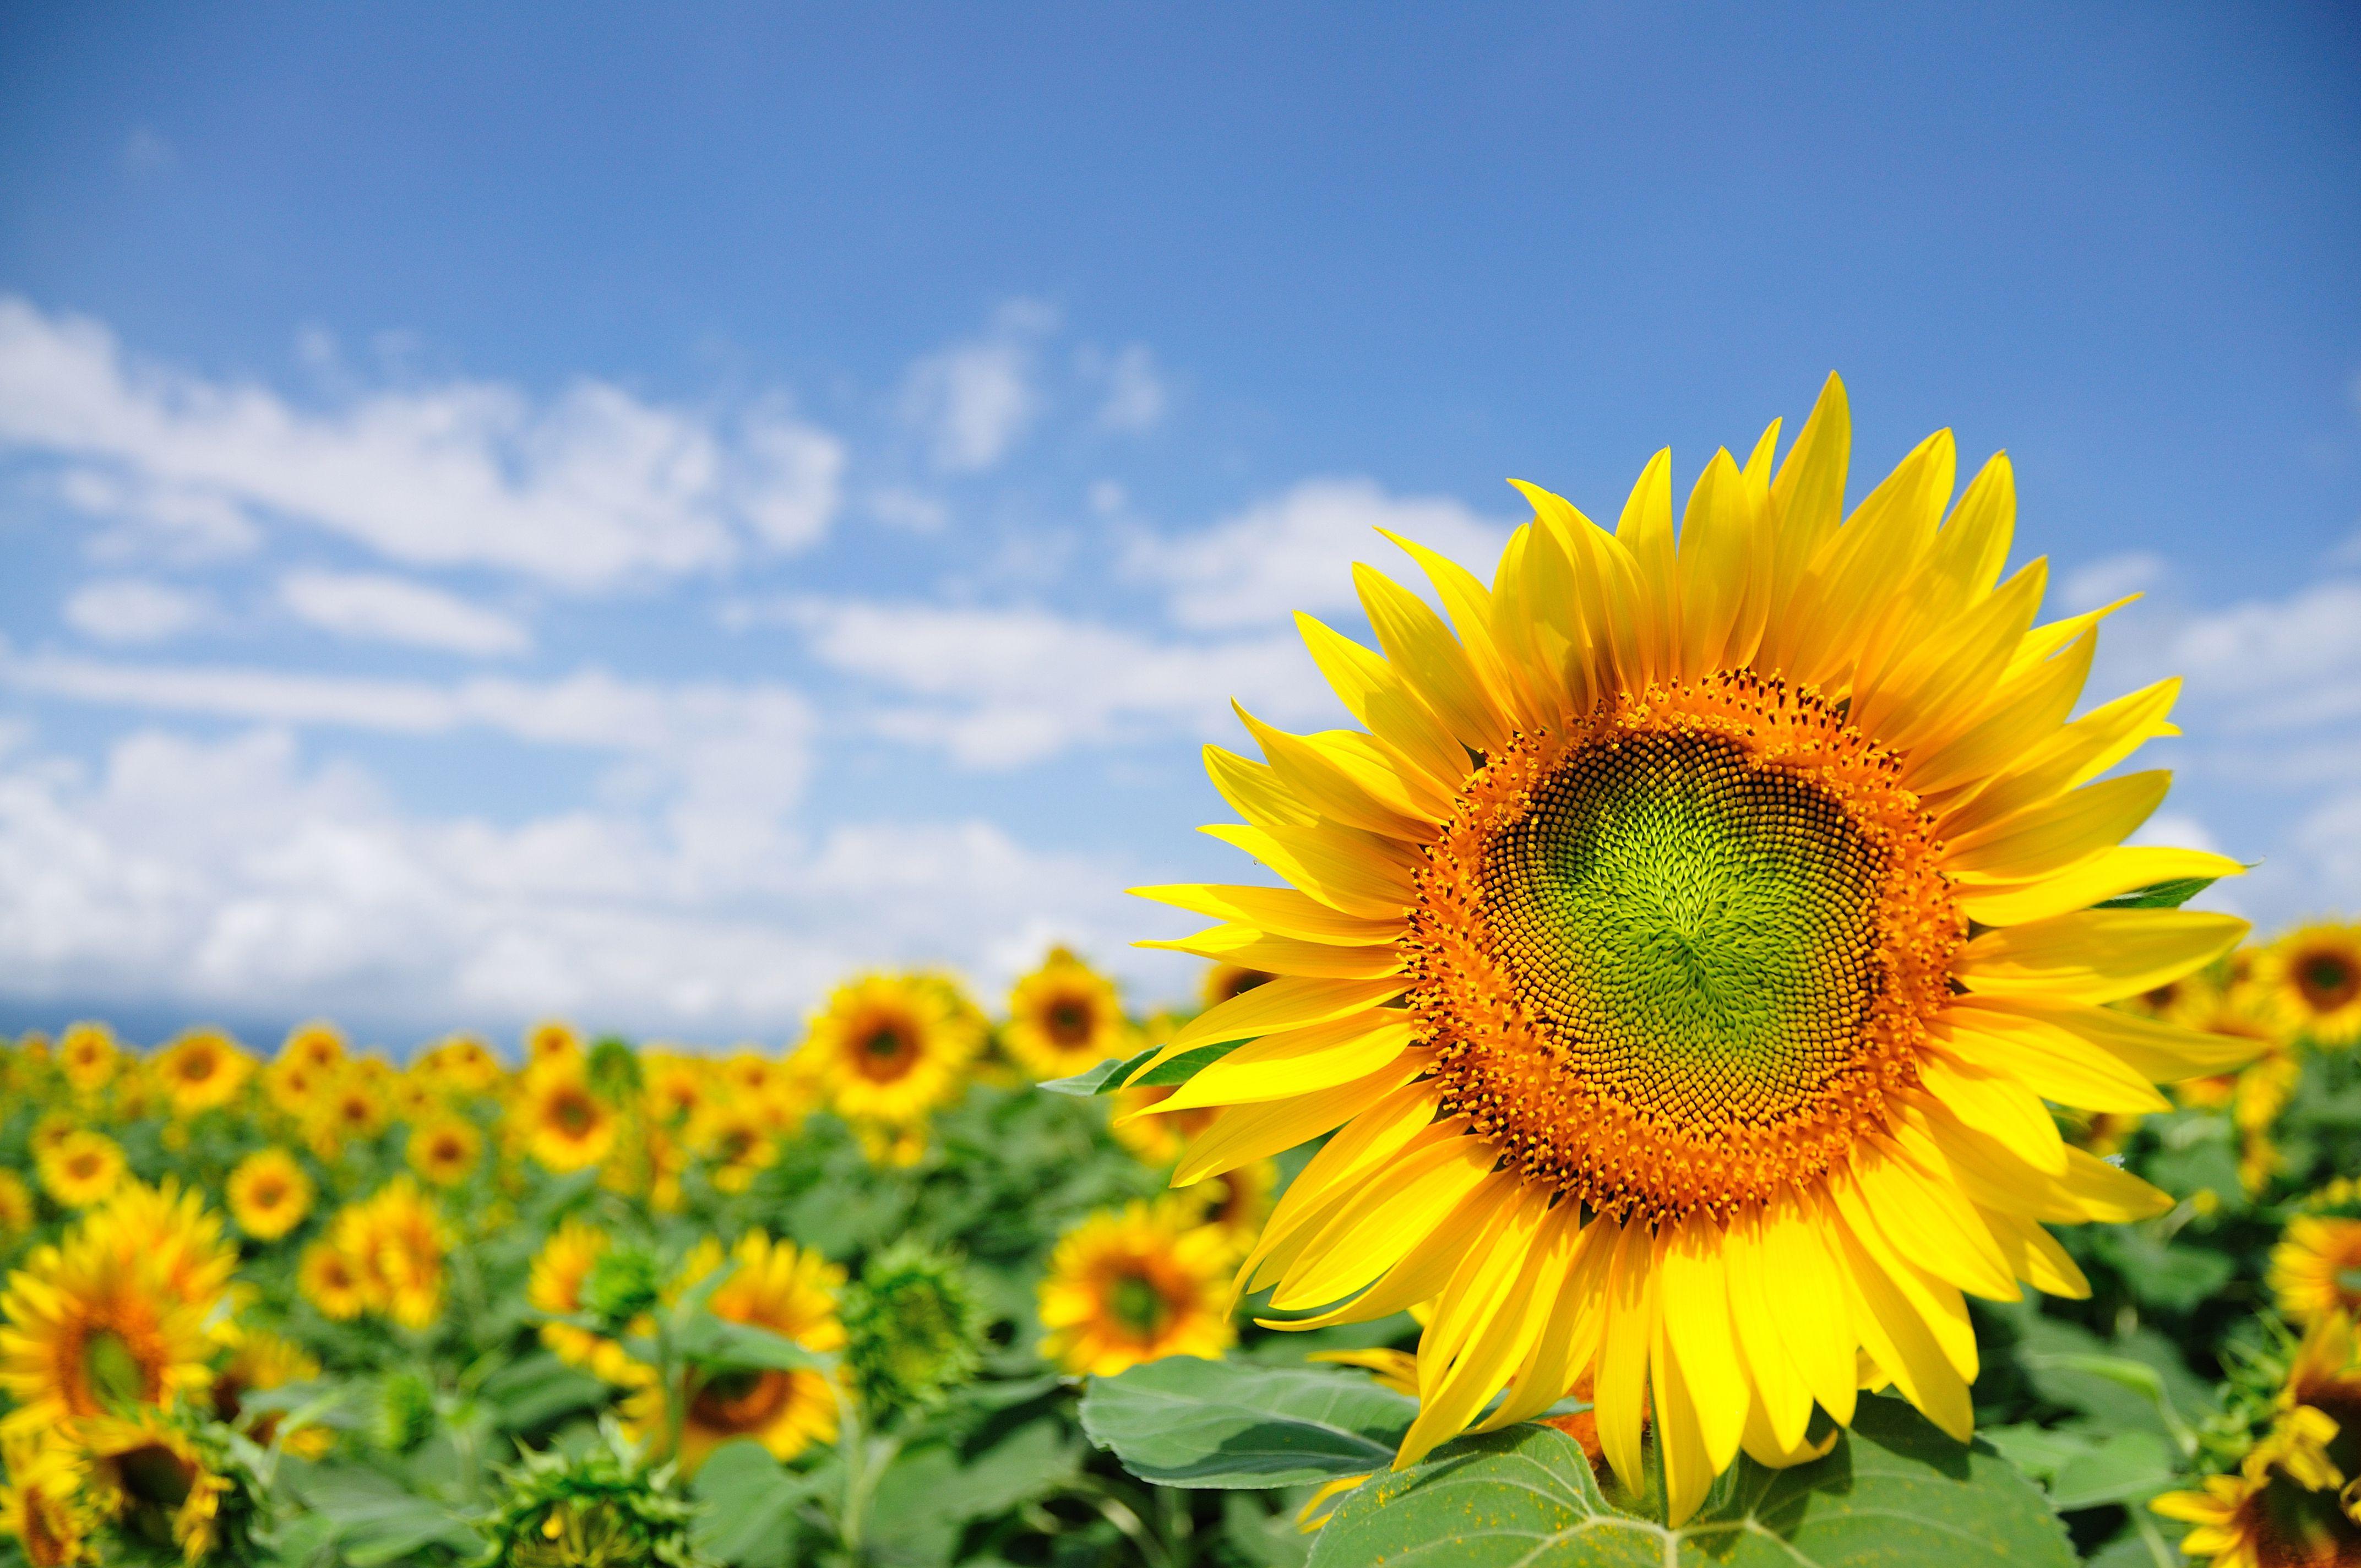 sunflower field 5a f96f7d dd24